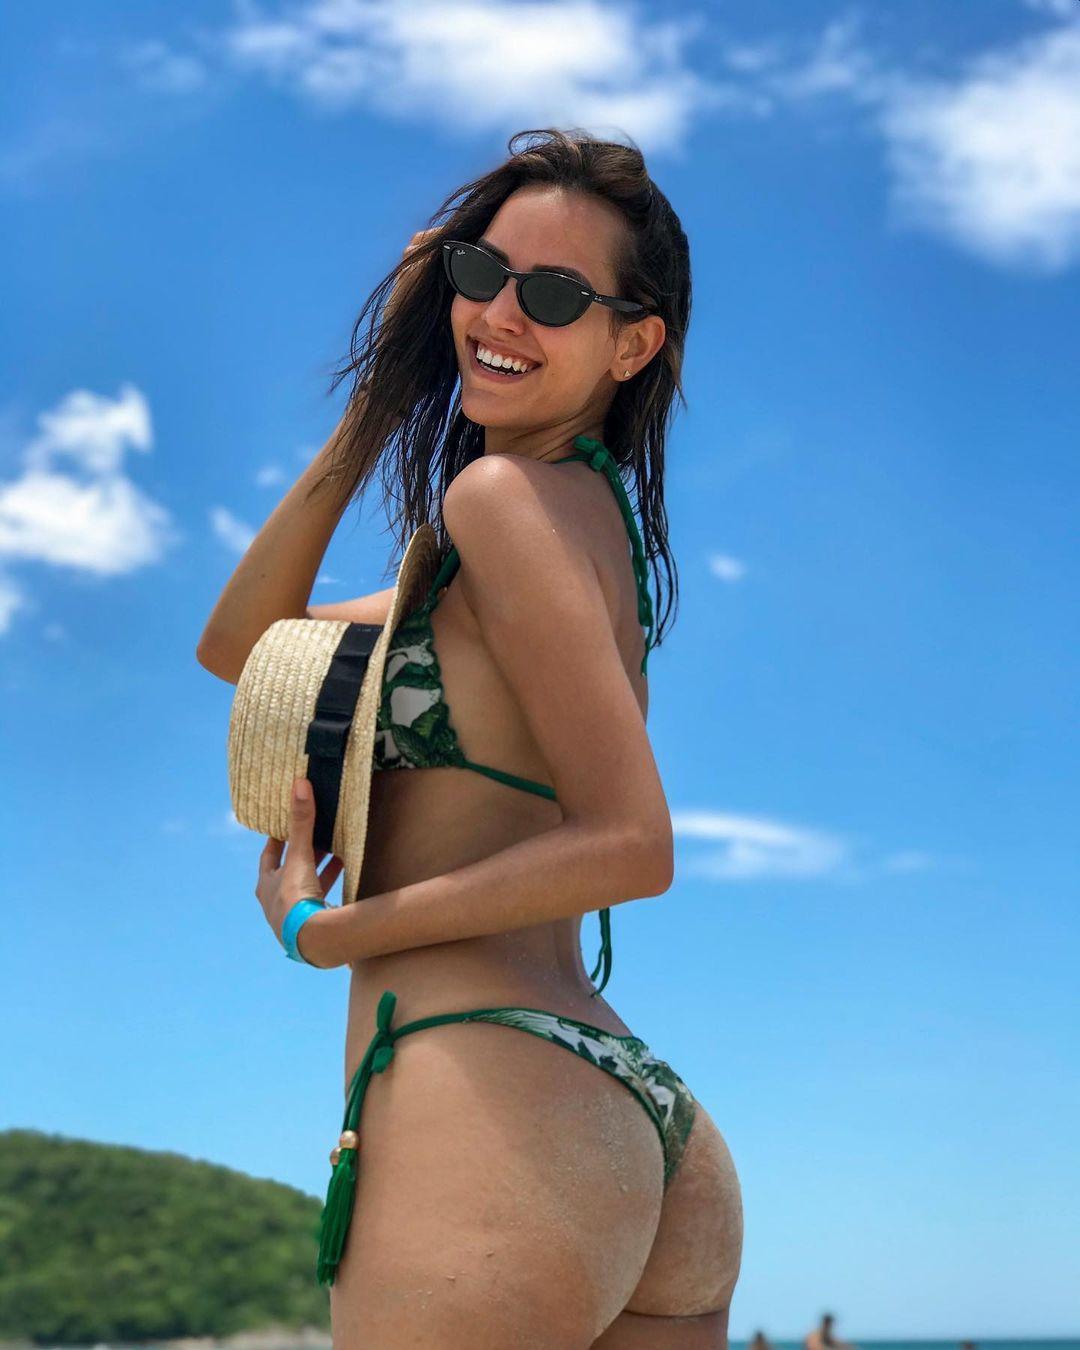 rafaella felipe, top 20 de miss brasil mundo 2019. - Página 2 Qlqn8x10